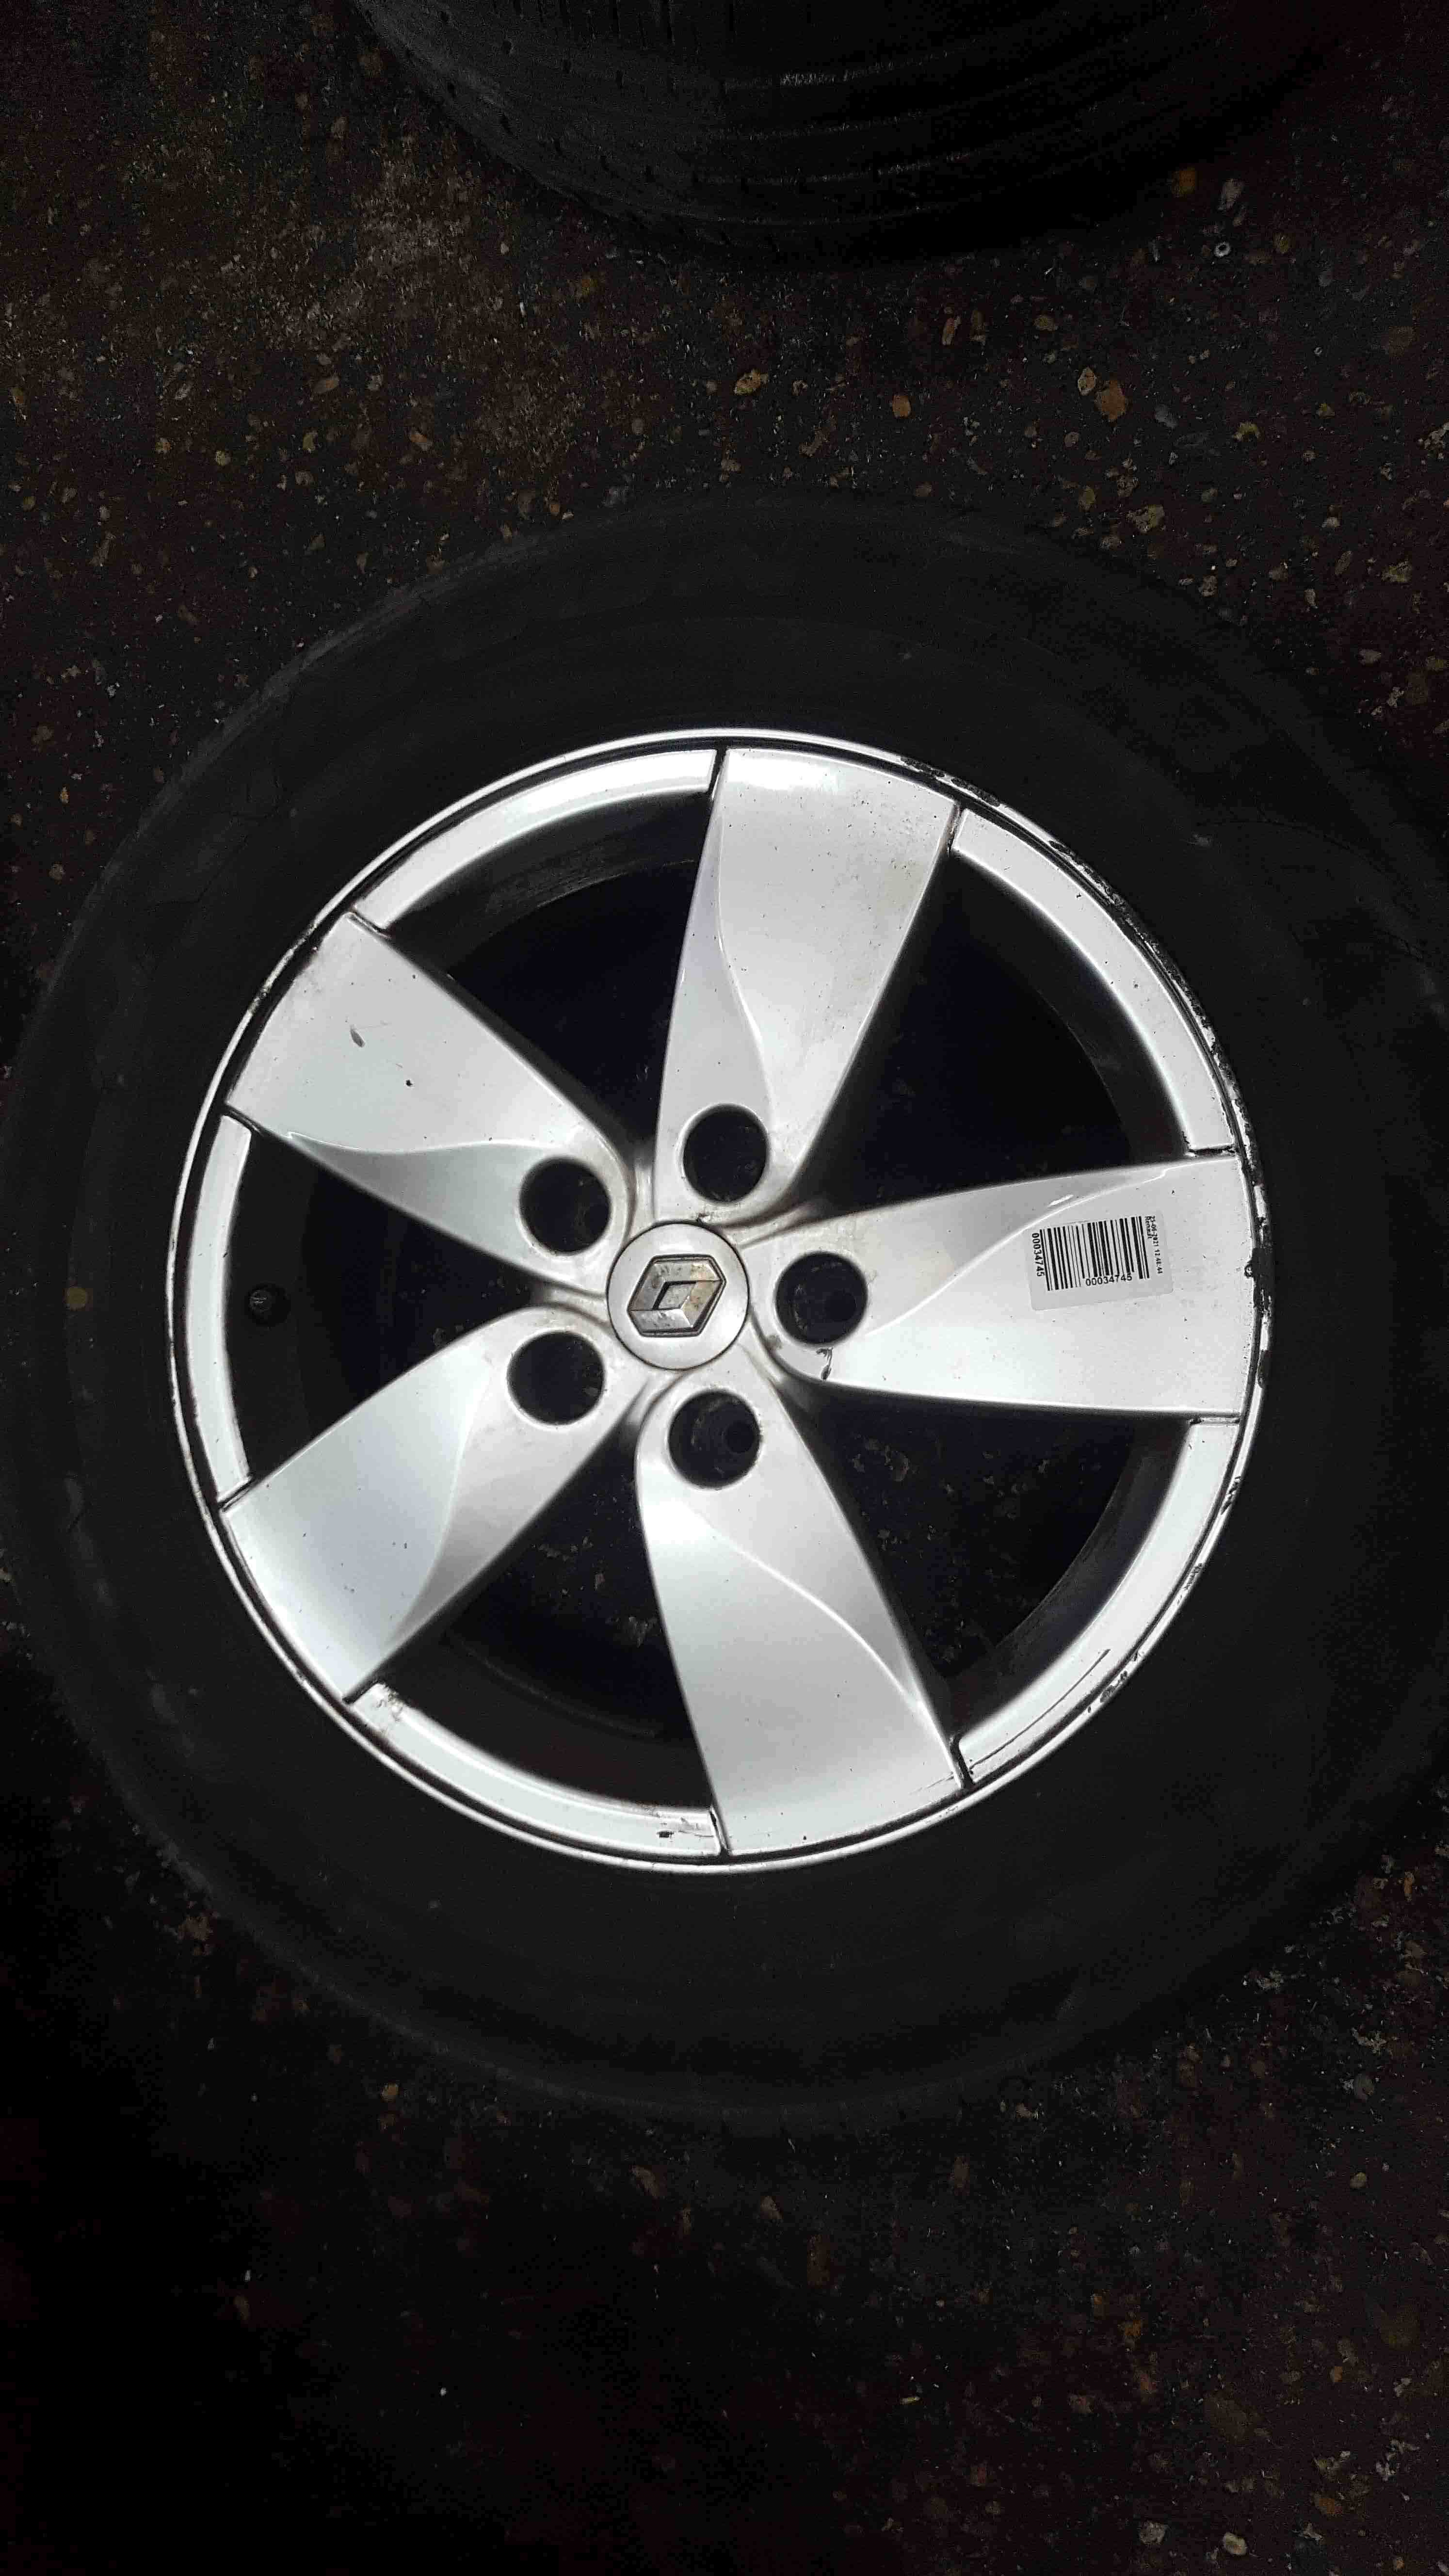 Renault Megane MK3 2008-2014 Proteus Alloy Wheel + Tyre 205 60 16 4mm